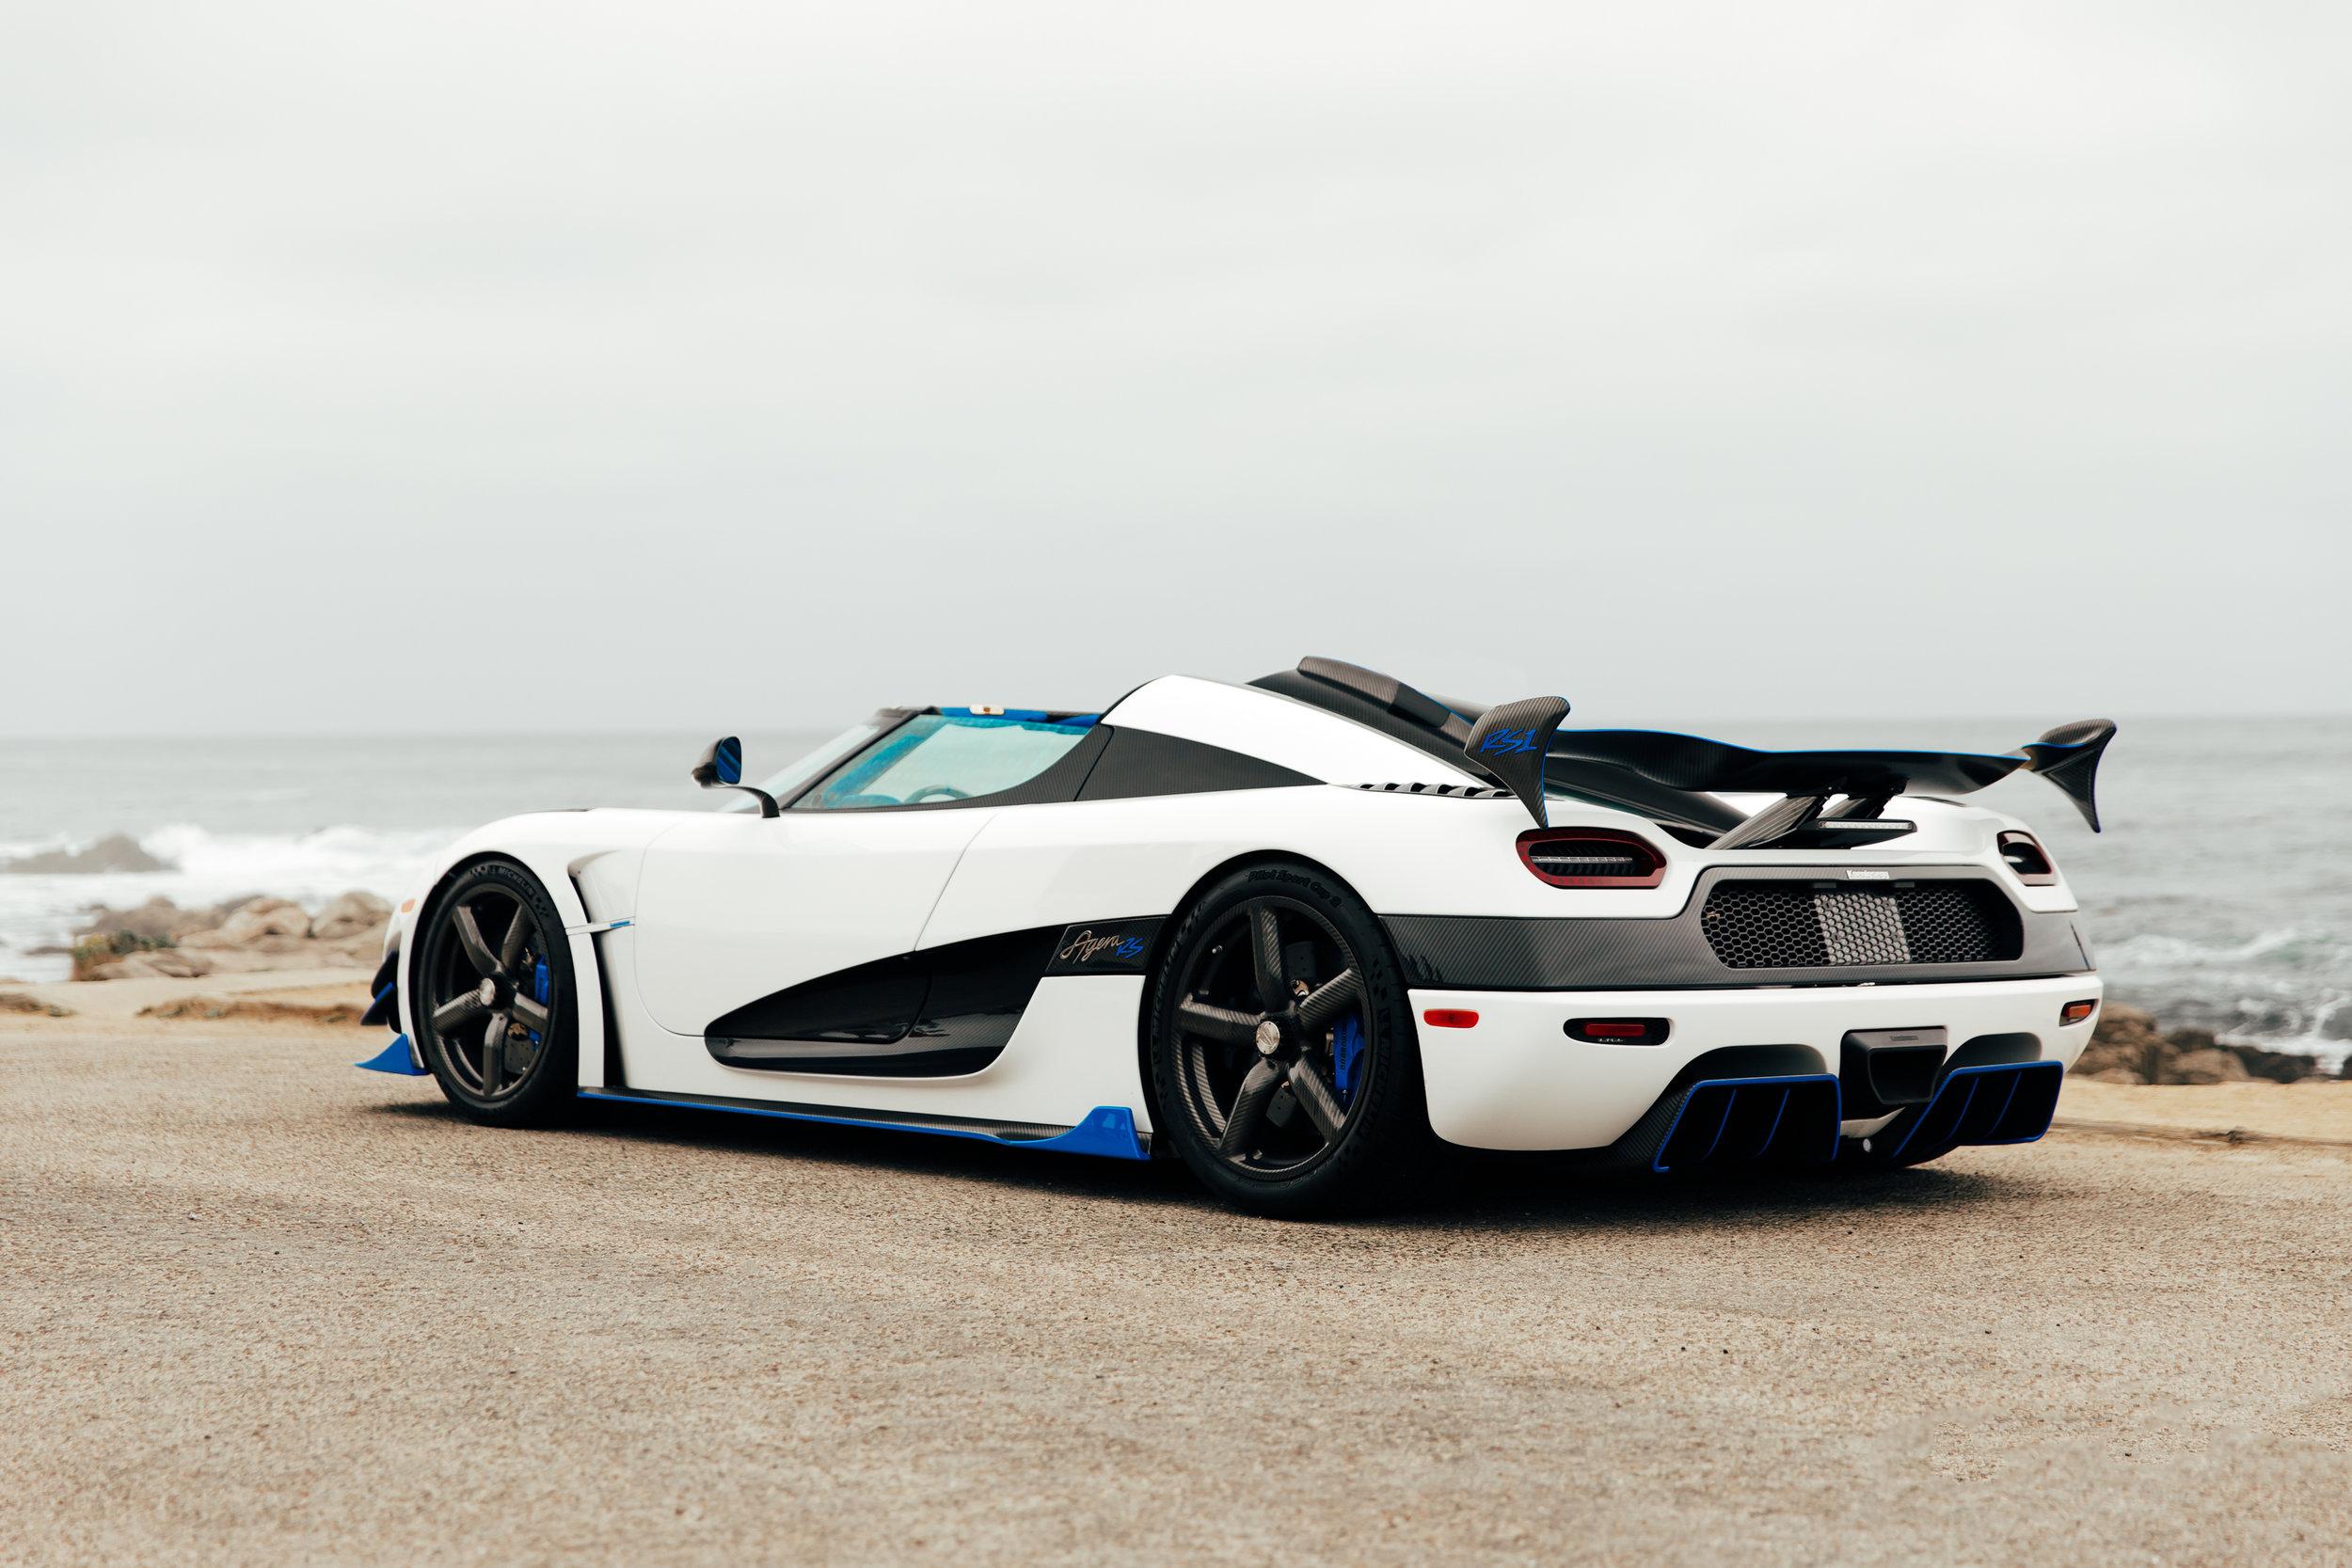 Stay_Driven_Monterey_Car_Week_Whitesse_Koenigsegg-31.jpg